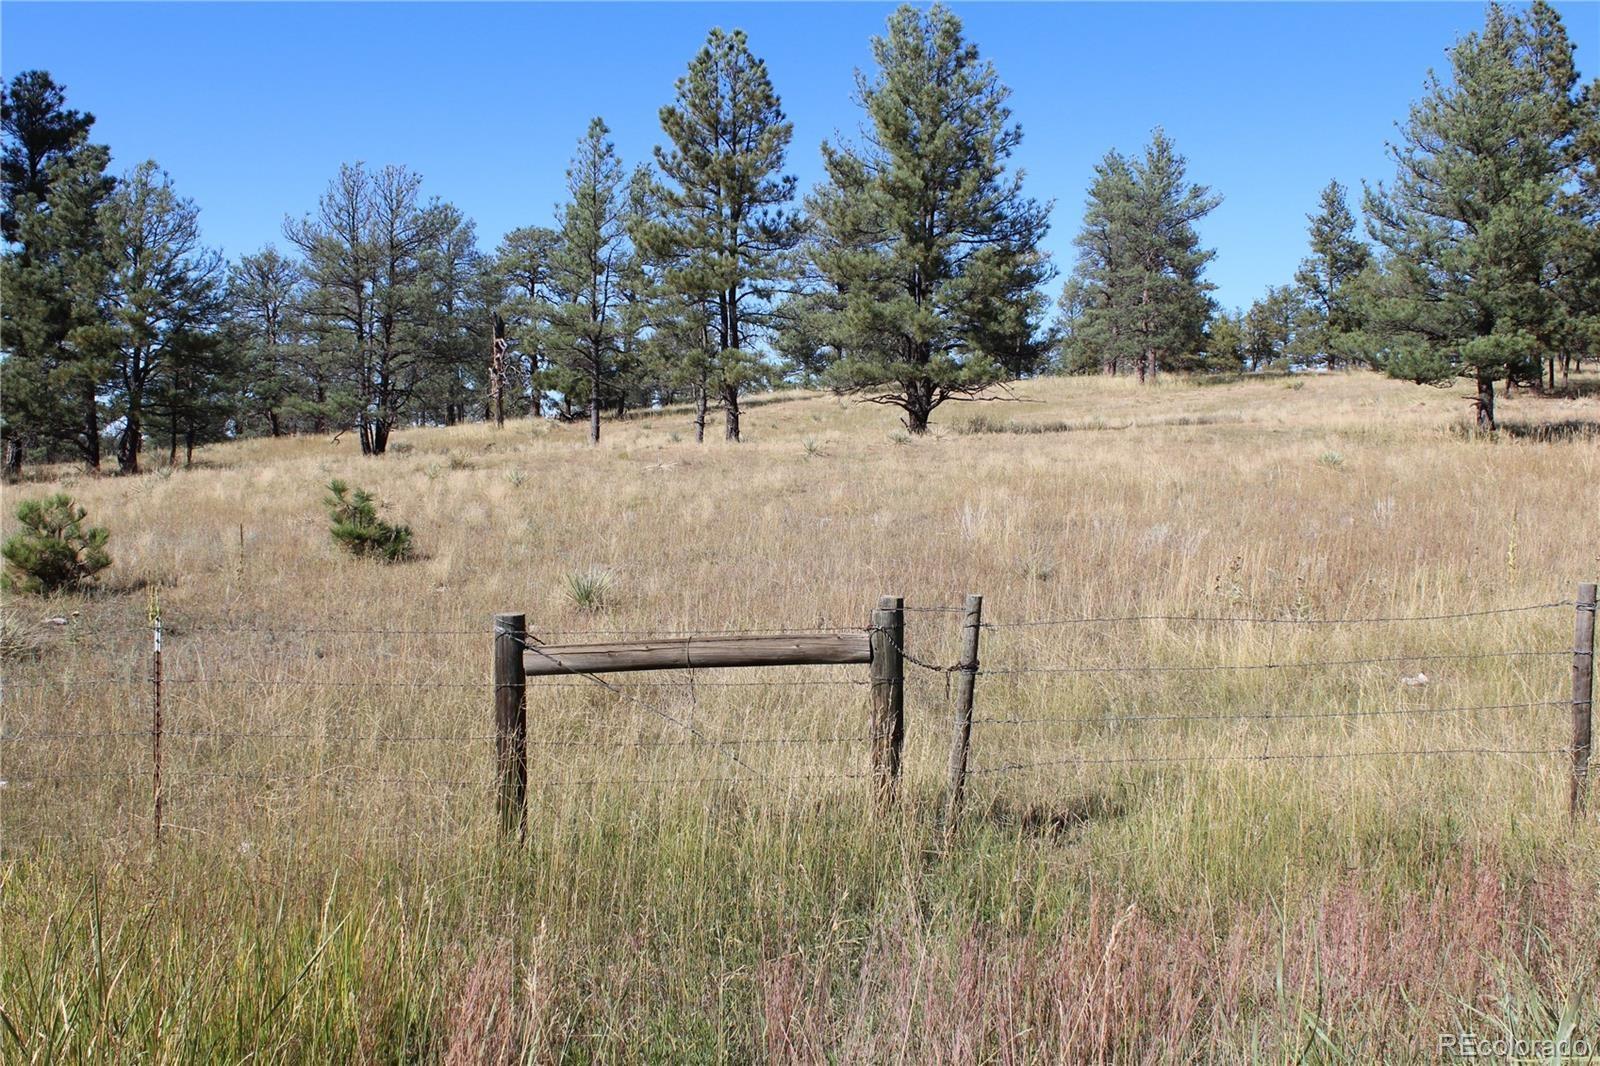 MLS# 2877174 - 18 - Cattle Circle, Kiowa, CO 80117